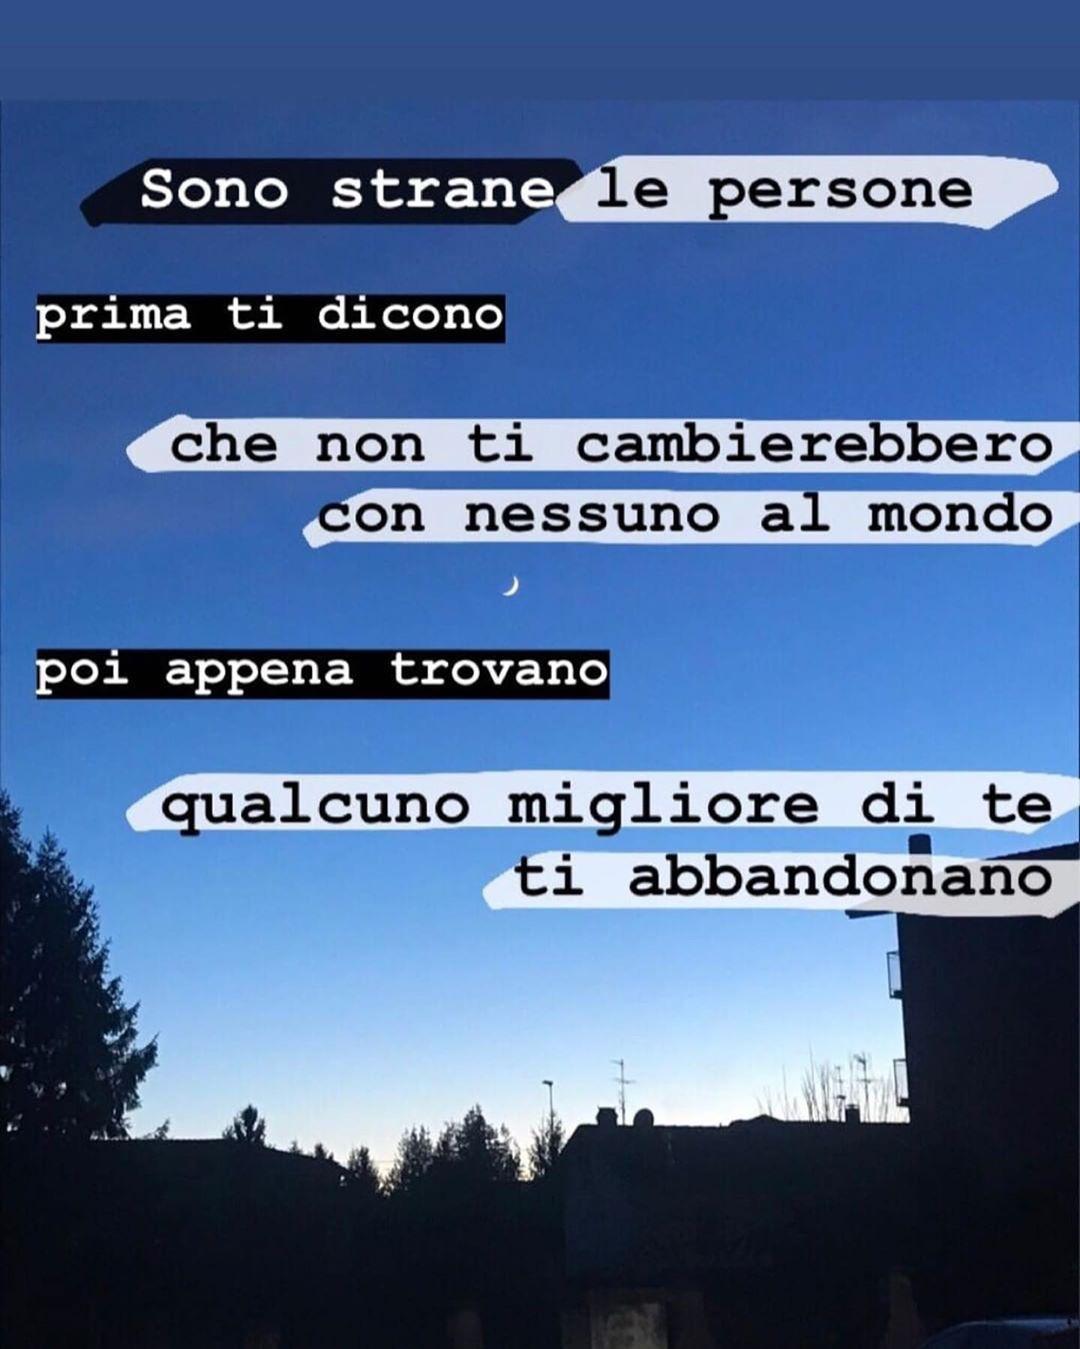 [New] The 10 Best Inspirational Quotes Today (with Pictures) -  segui @frasisusfondi per altre frasi. tagga la persona che hai pensato leggendo questo post. _________________________ #frasi #frasiitaliane #miglioreamica #frasitumblr #tumblr #wallpaper #sfondi #loveyou #missyou #tiamo #mimanchi #giveaway #dailyquotes #frasicoatte #coatte #amoremio #instagood #nevergiveup #frasiamore #amore #couple #couples #sfonditumblr #wallpapers #love #frecciatine #followforfollow #inspirationalquotes #quotes